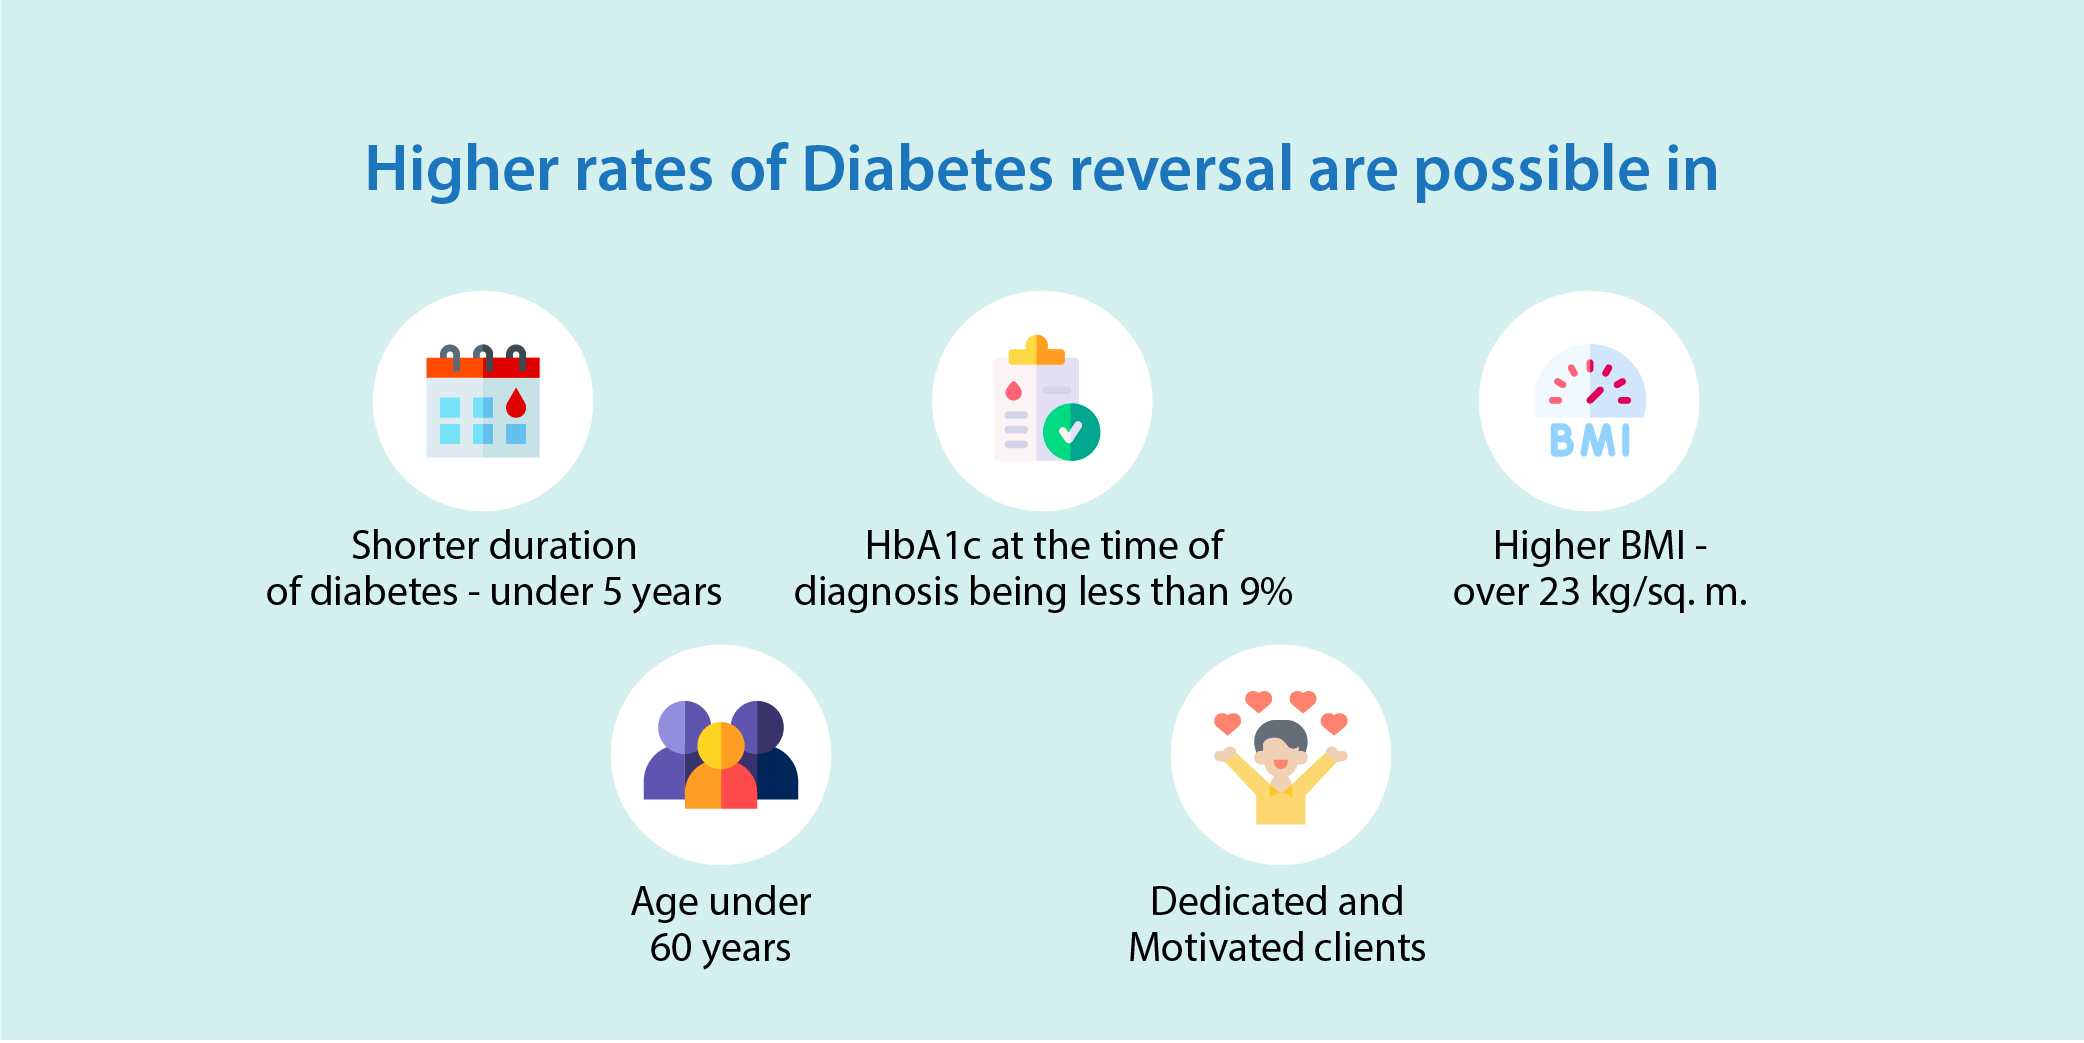 Higher rates of Diabetes Reversal